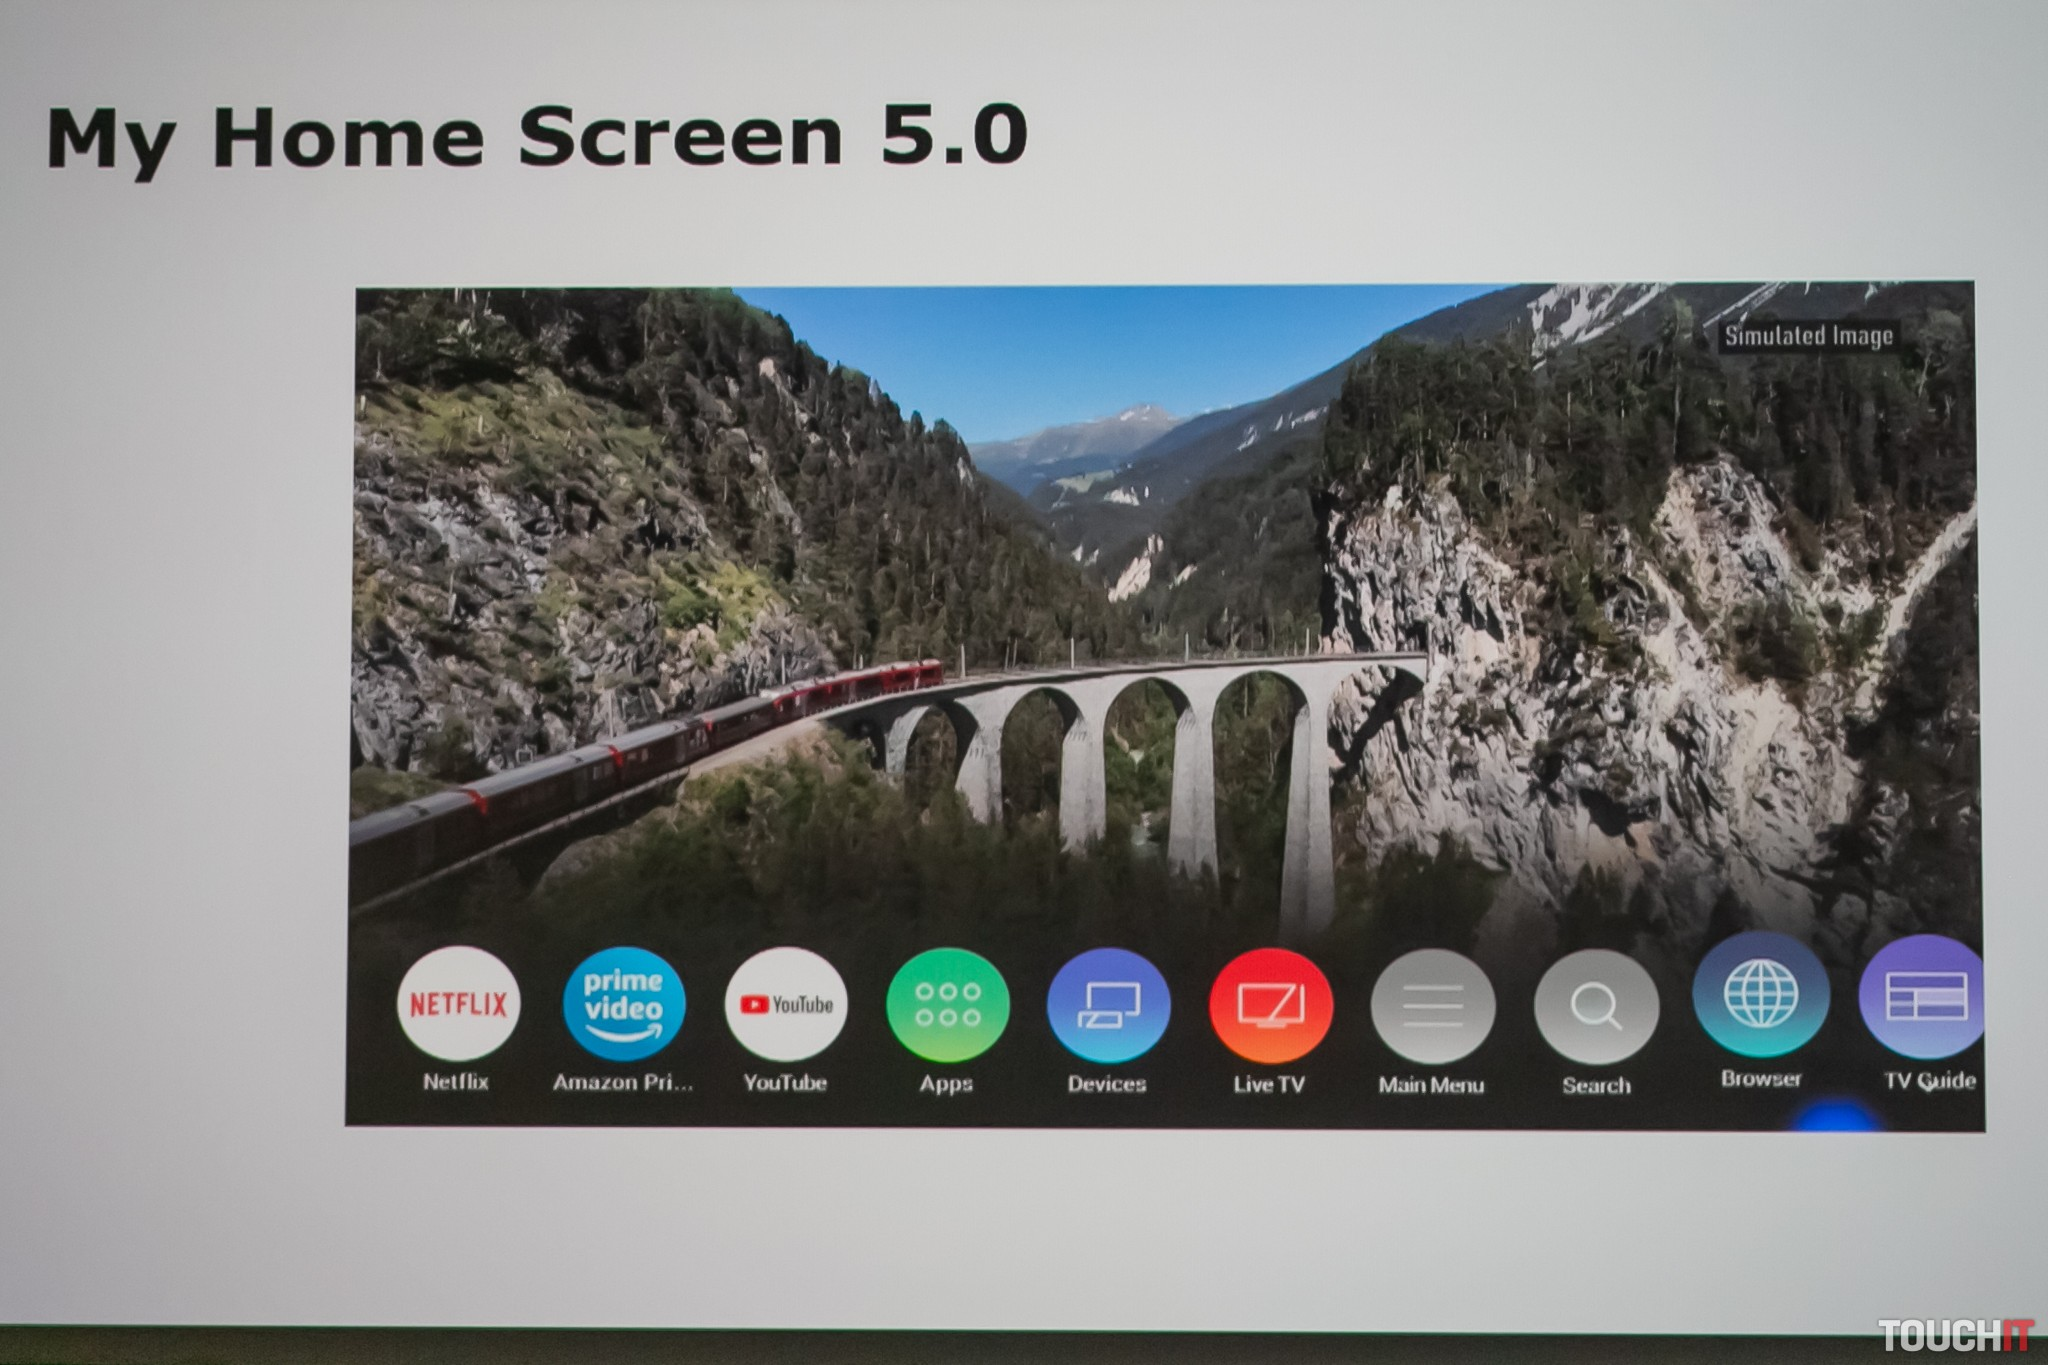 Panasonic MyHome Screen 3.0